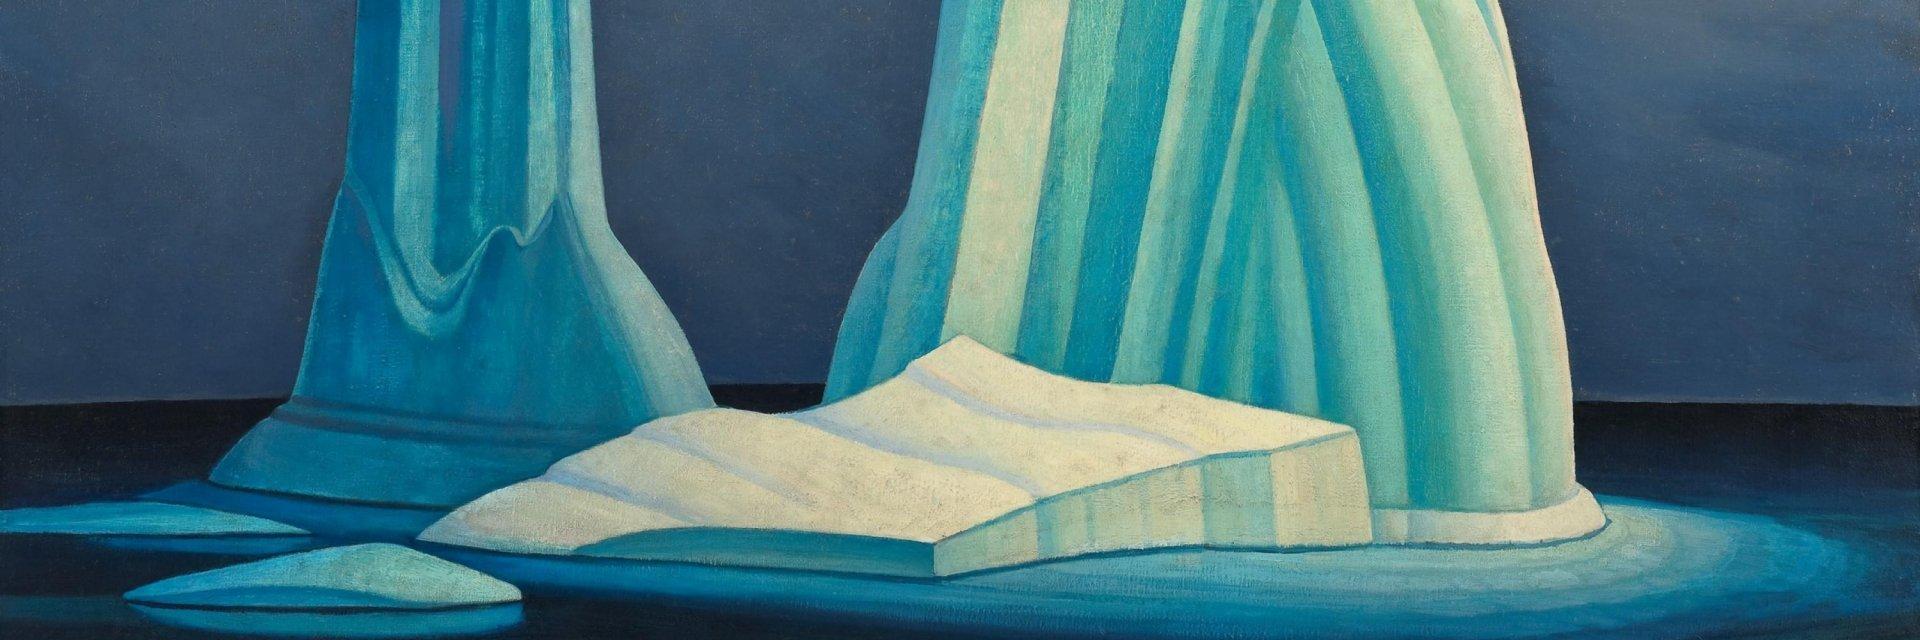 Kunsthal Rotterdam 'Magnetisch Noorden'- Lawren S. Harris Icebergs, Davis Strait 1930, McMichael